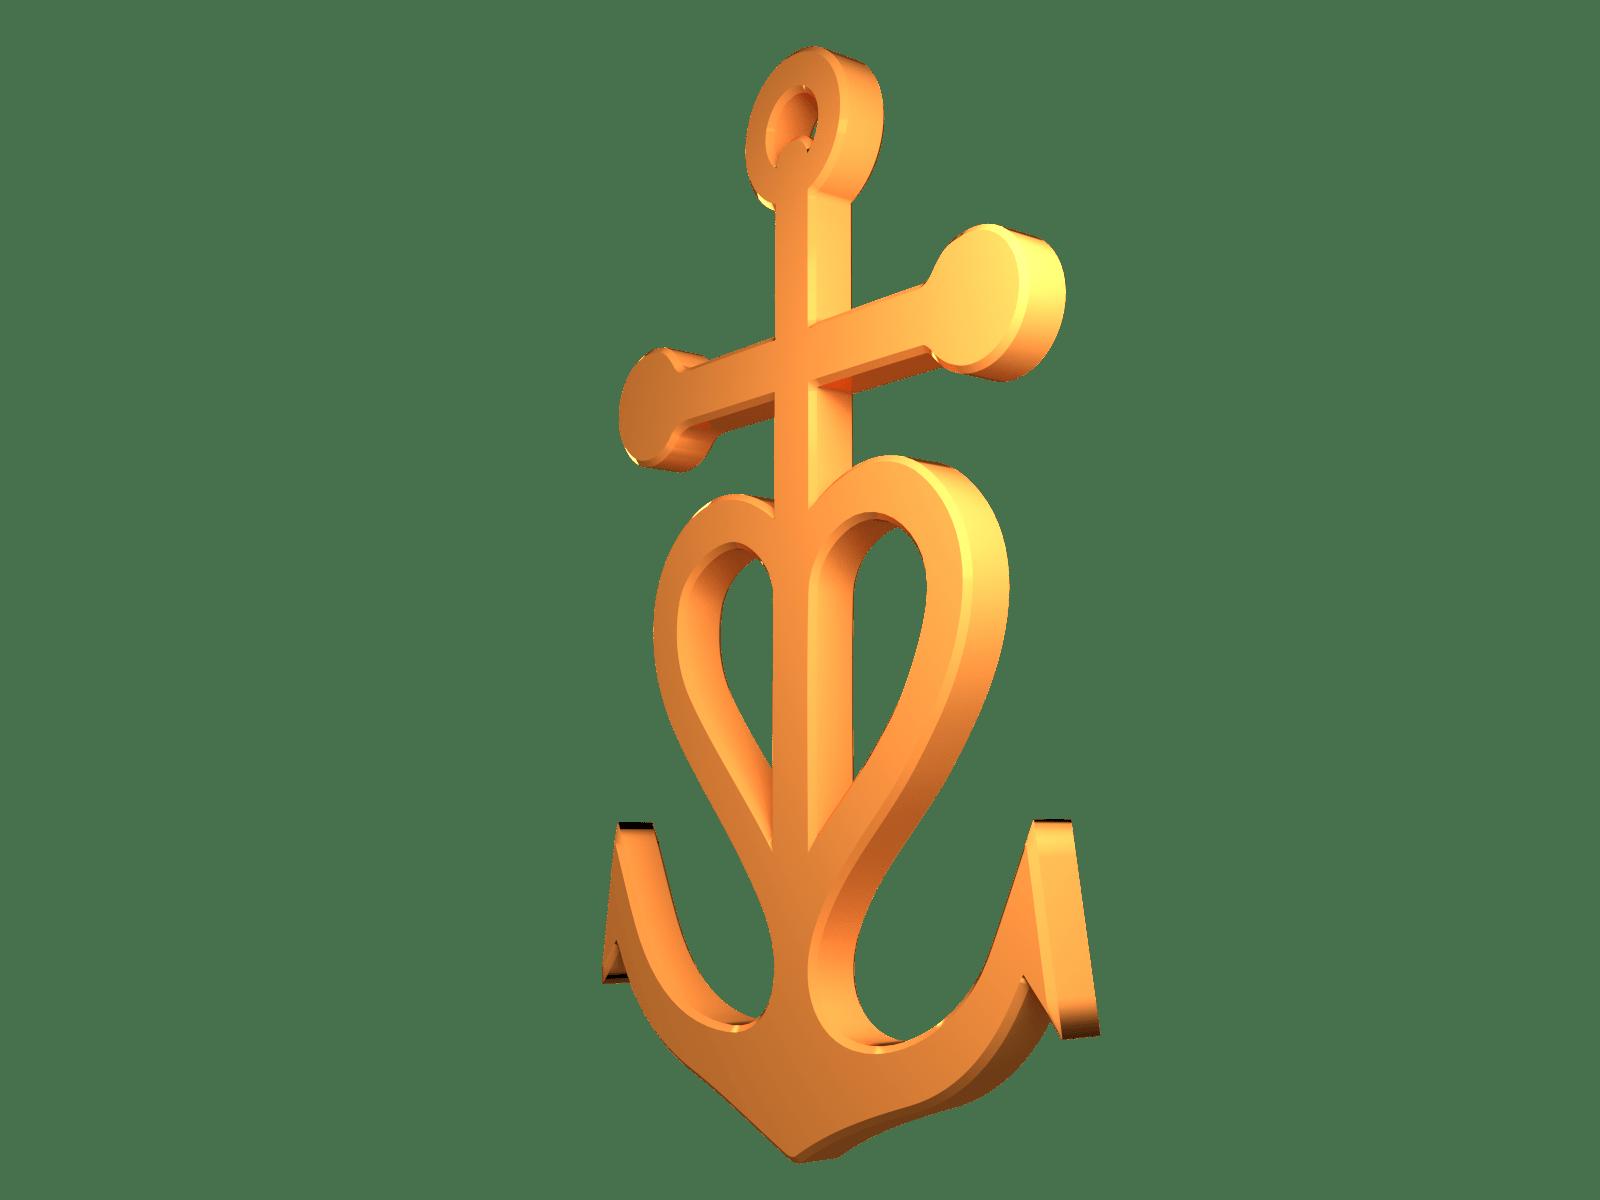 Christian Anchor Transparent Png Stickpng